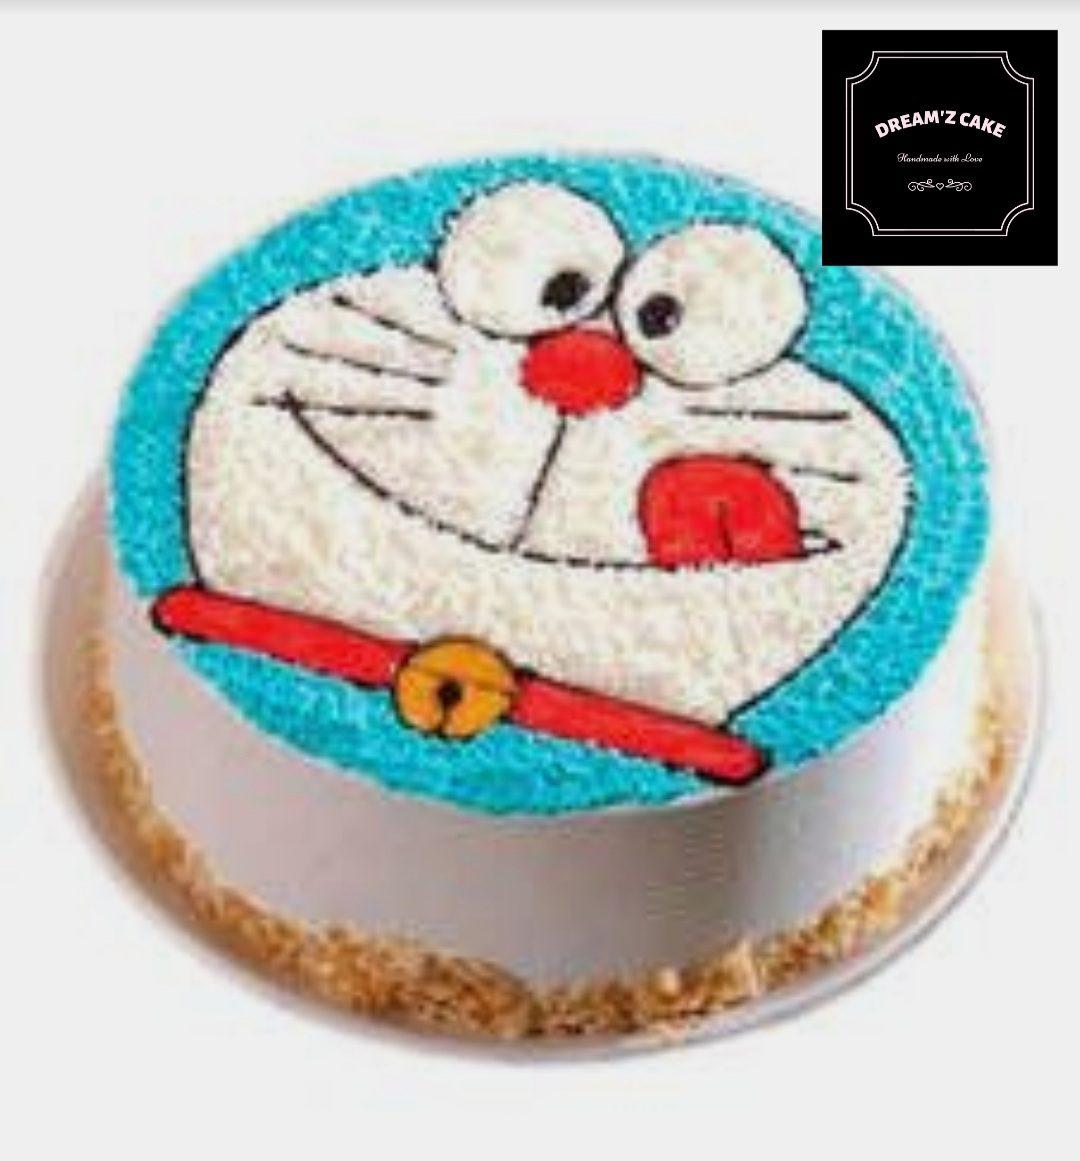 Doraemon Cartoon Theme Cake Designs, Images, Price Near Me